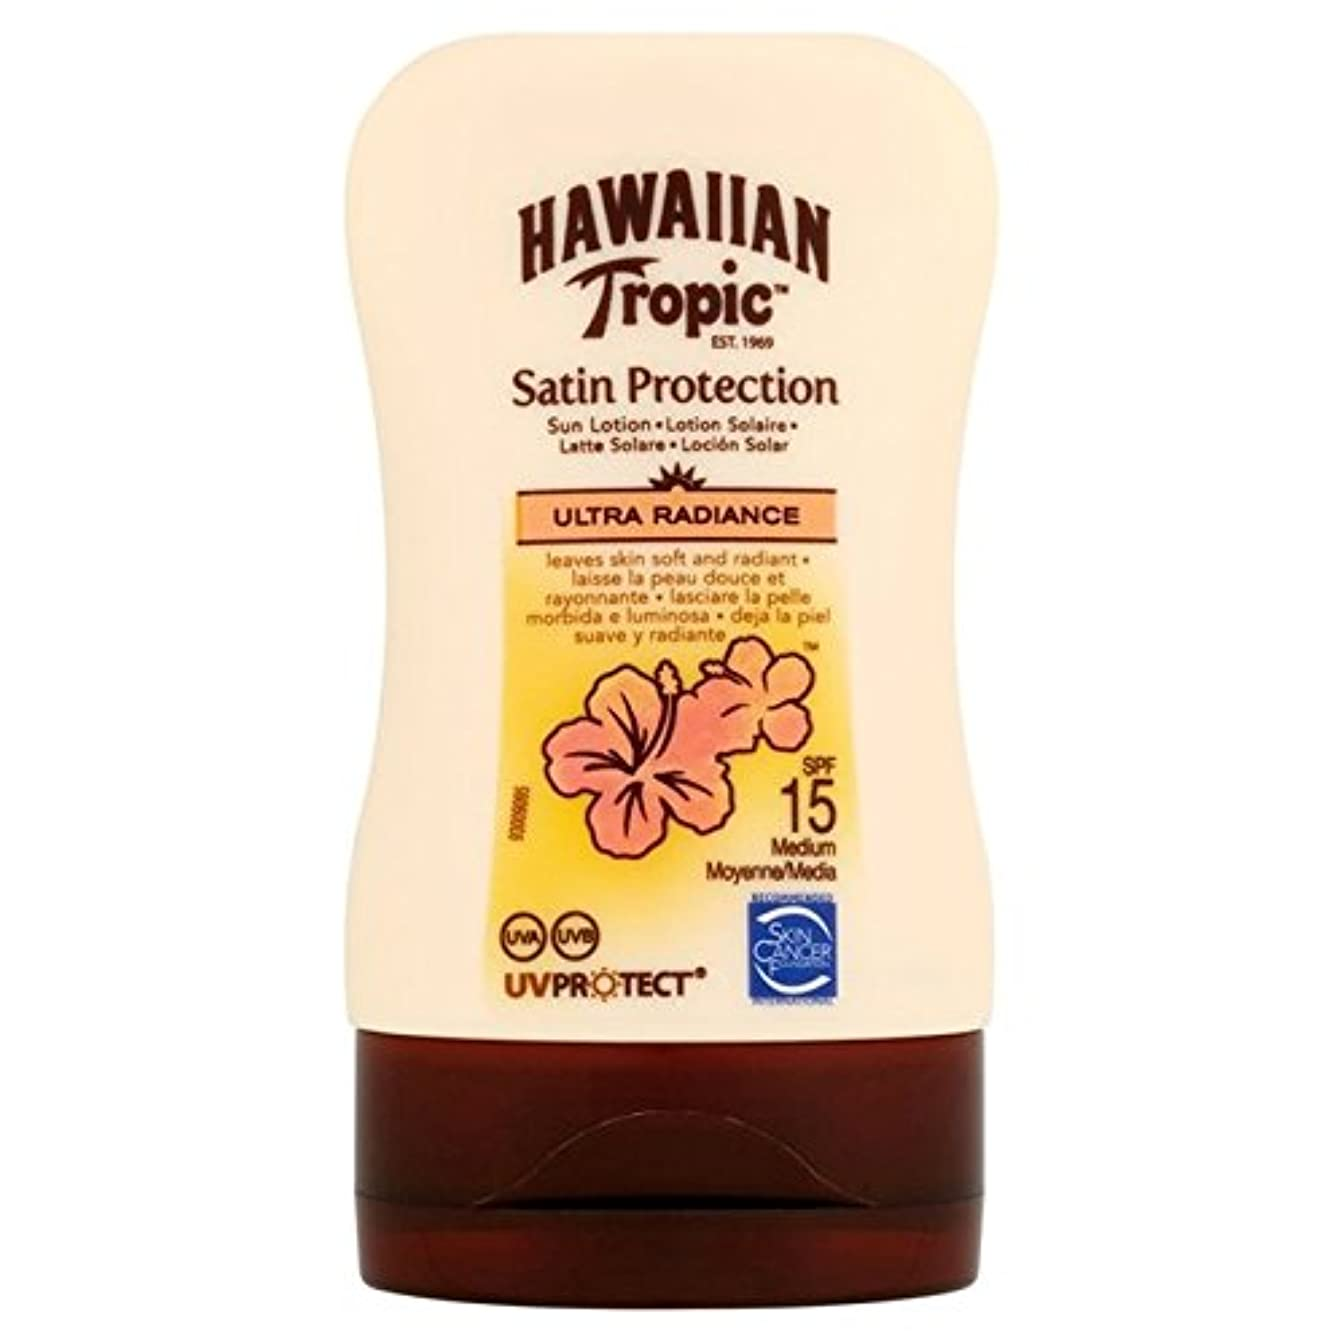 Hawaiian Tropic Protective Lotion SPF15 Ultra Radiance 100ml - 南国ハワイの保護ローション15超放射輝度100ミリリットル [並行輸入品]